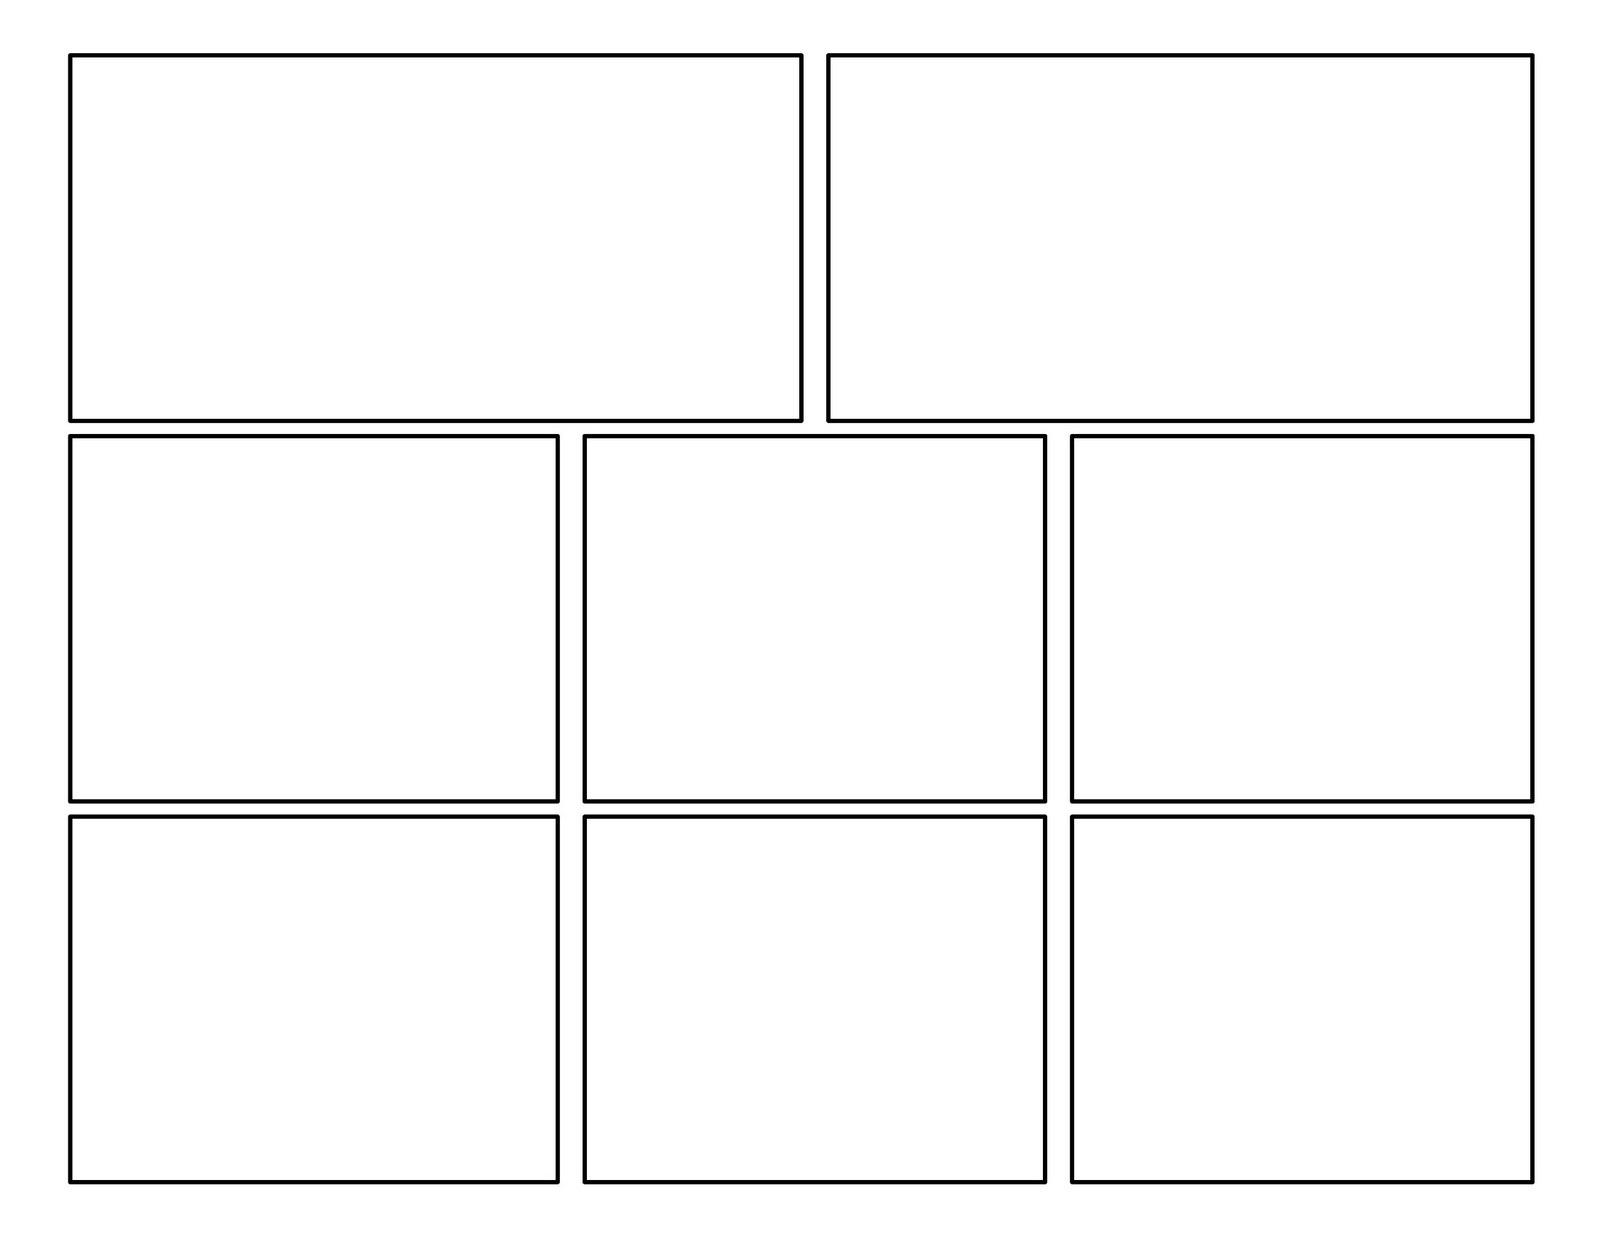 free 9 square bingo template | sports bet skill: scaixin.com/?p=9640